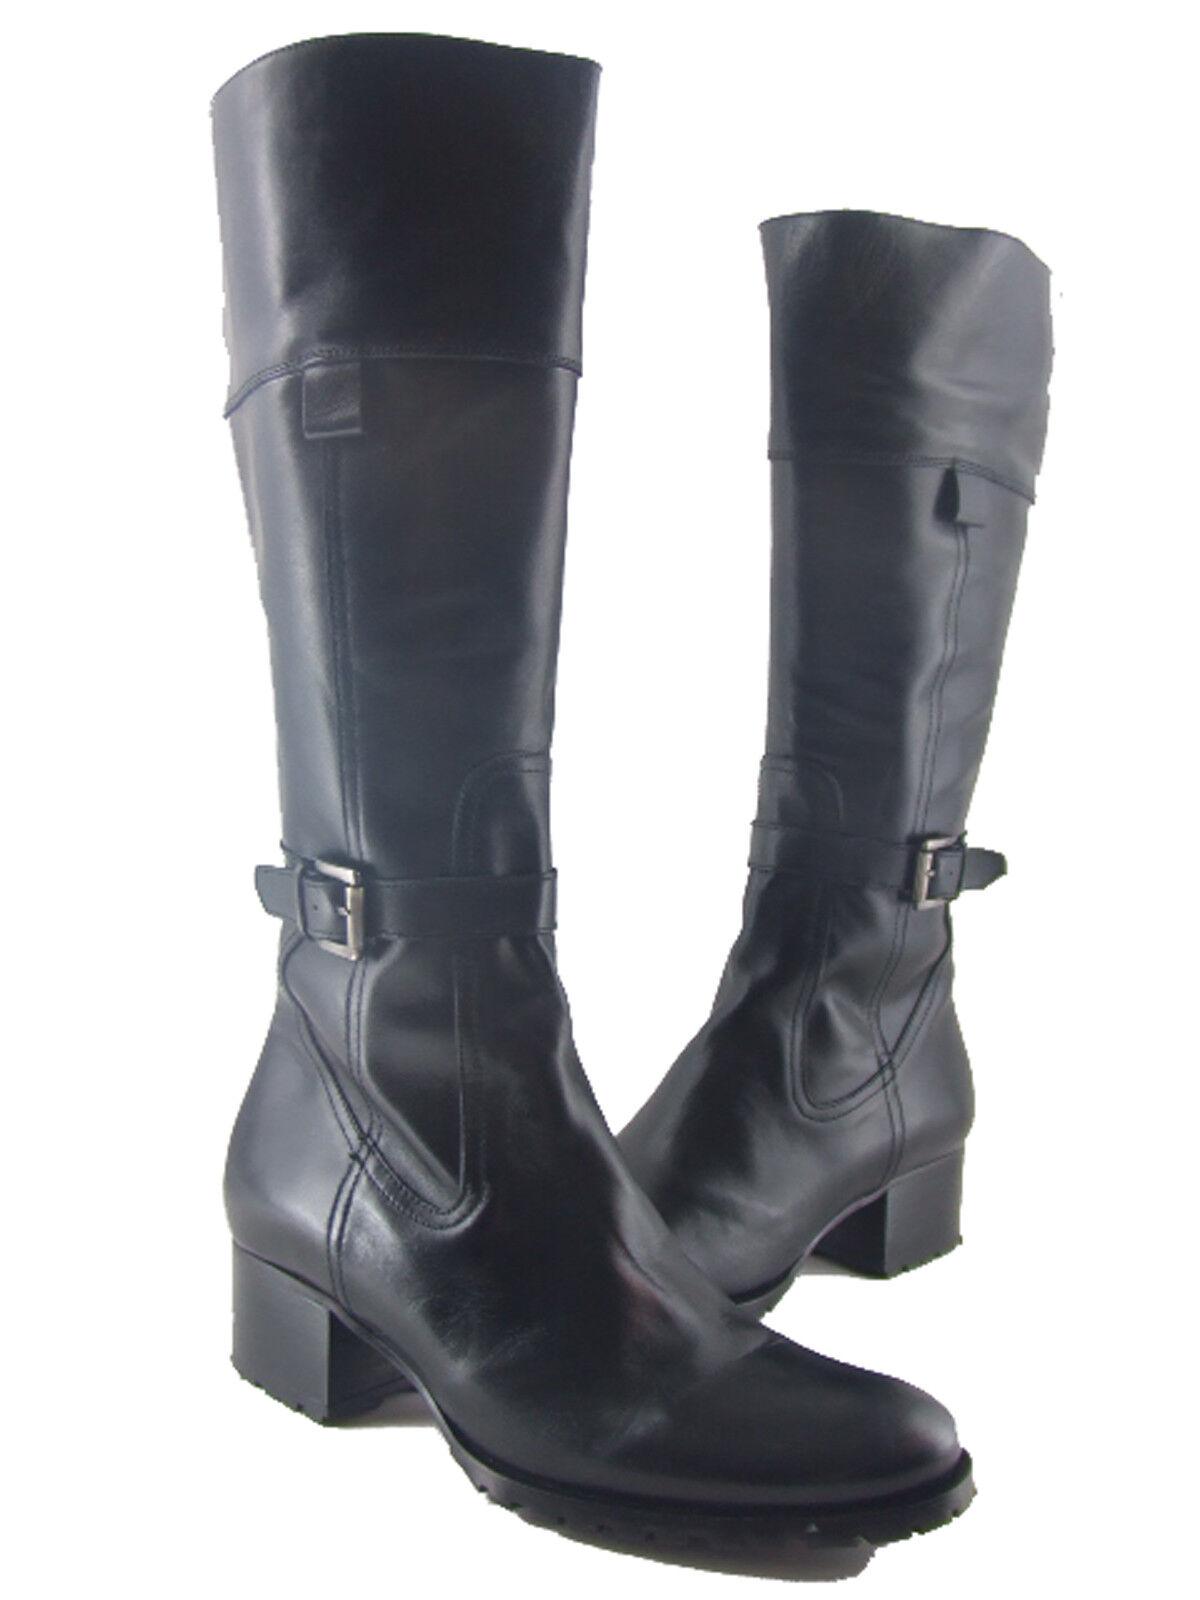 Oh  Michelle 3072 Berlín Foster Negro botas Negras Talla EU40 US9.5